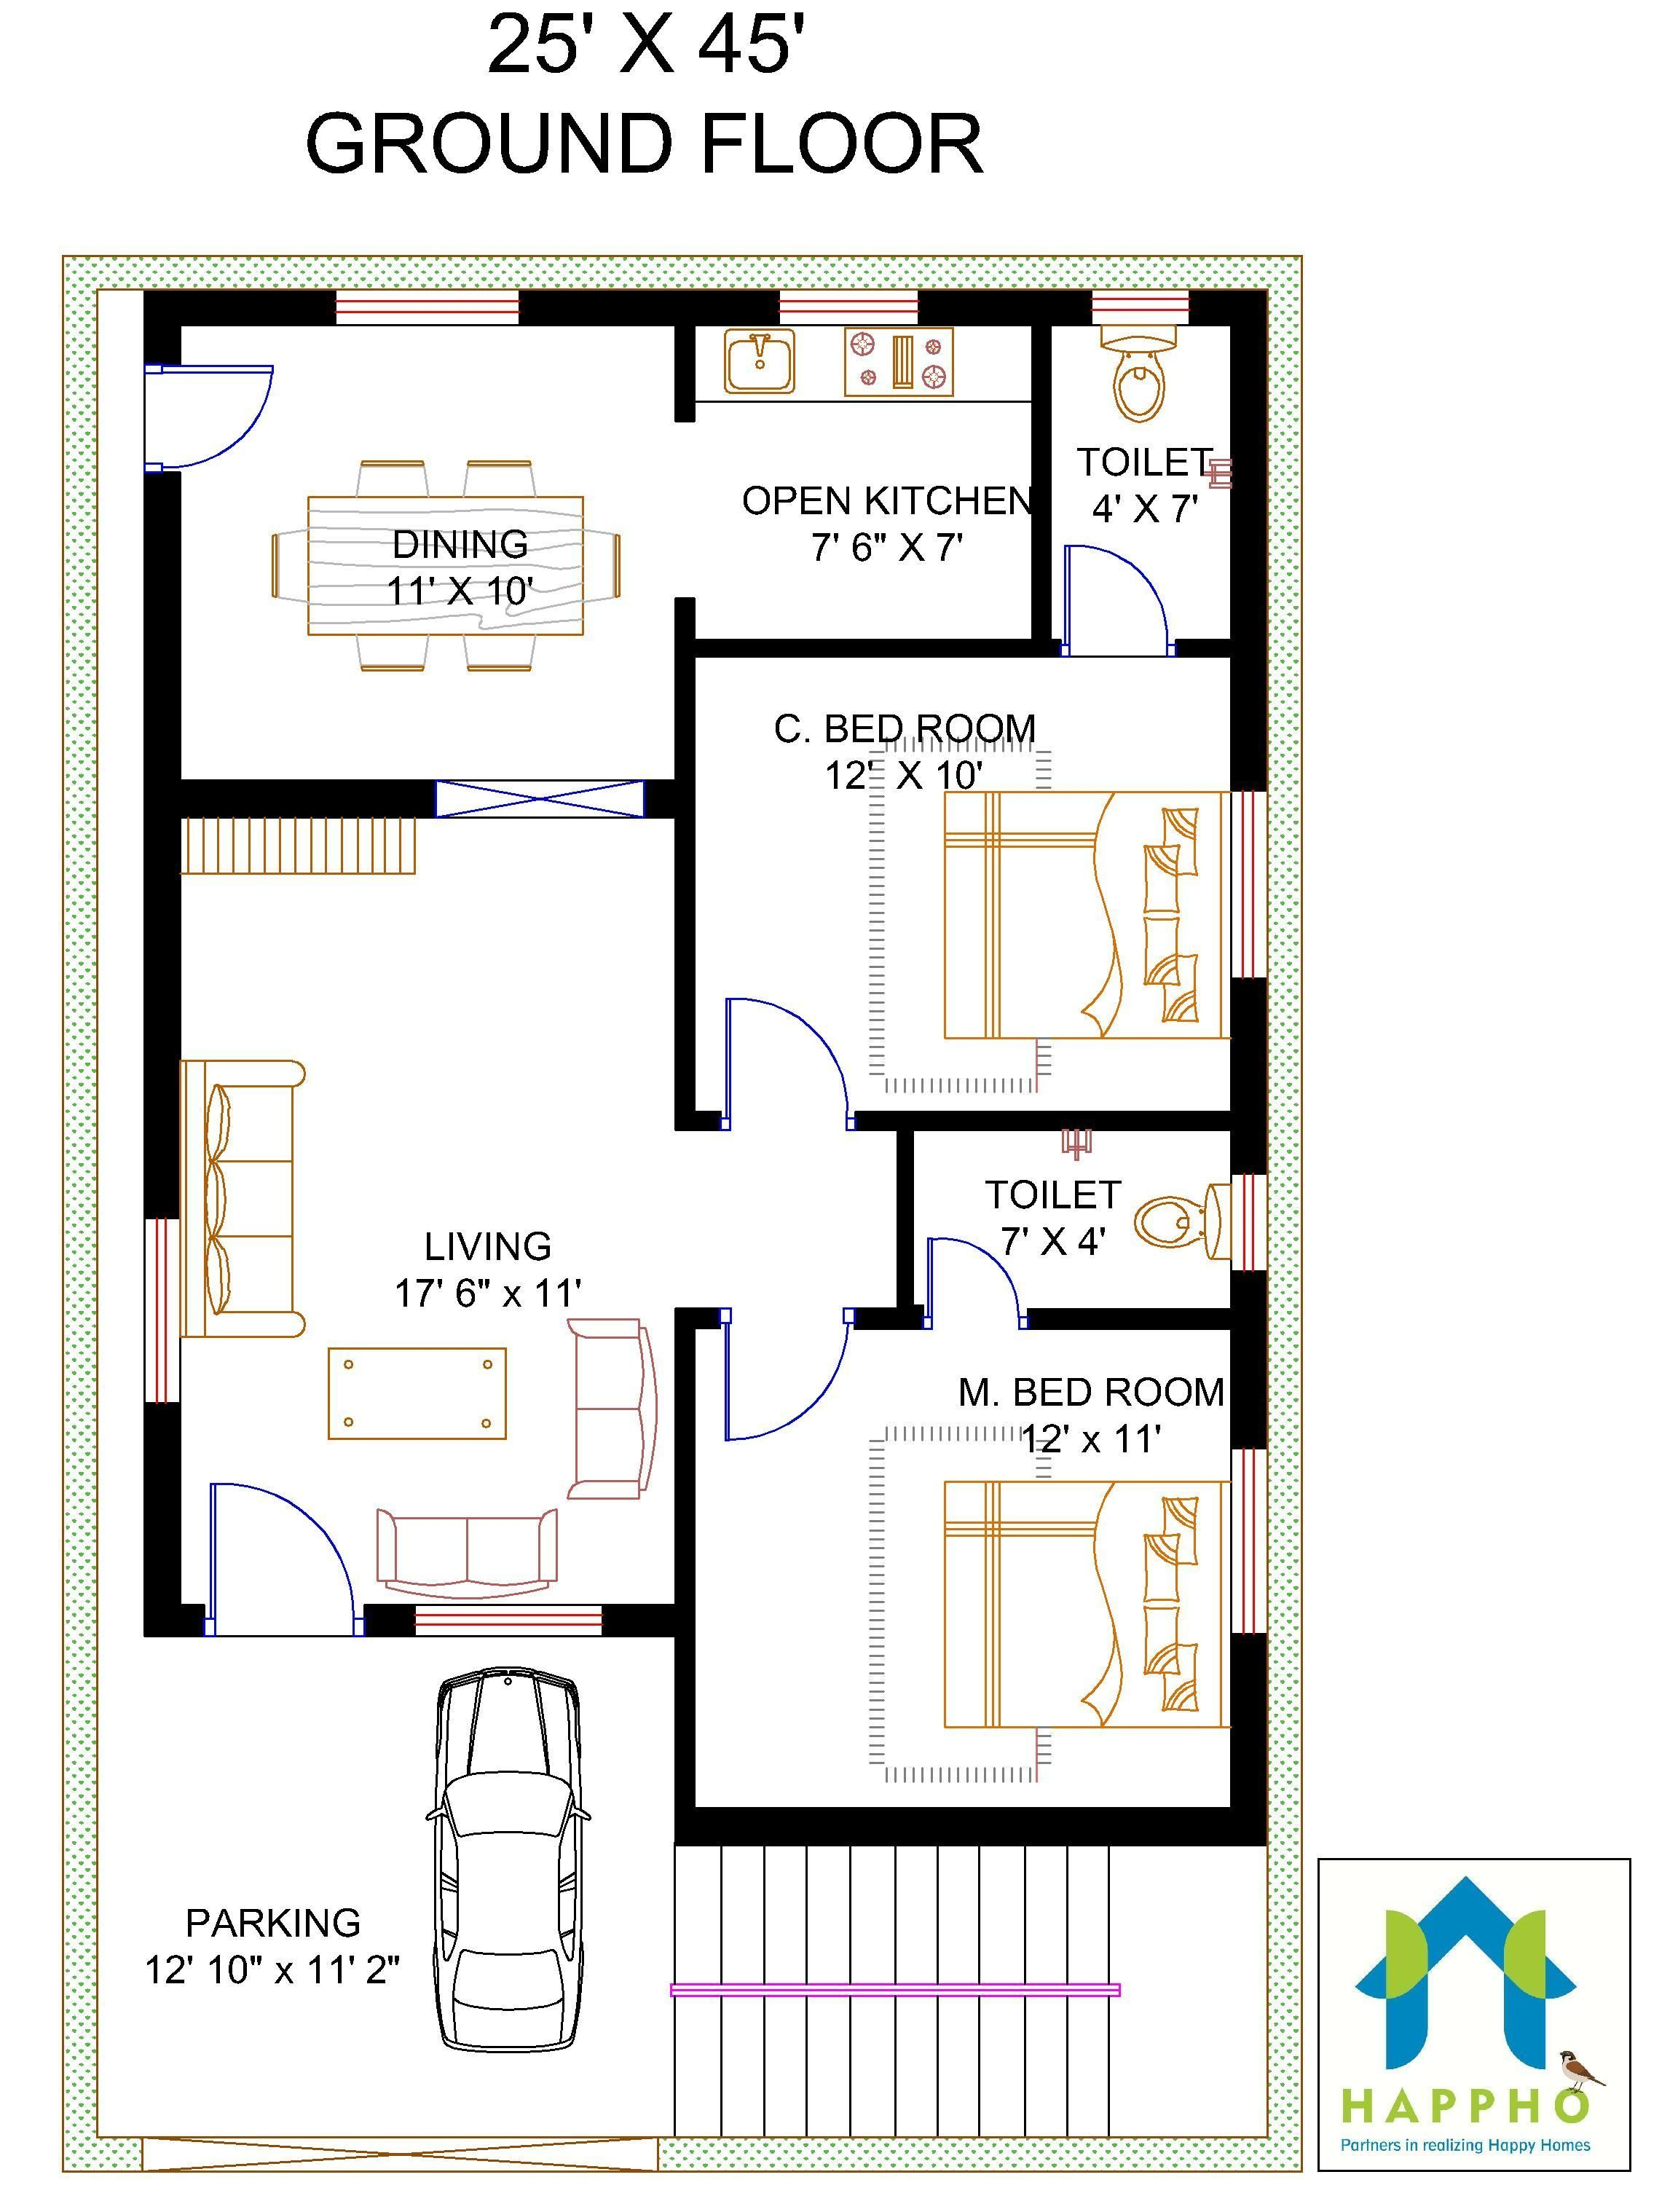 Free Duplex House Design: 2 BHK Floor Plans Of 25*45 - Google Search